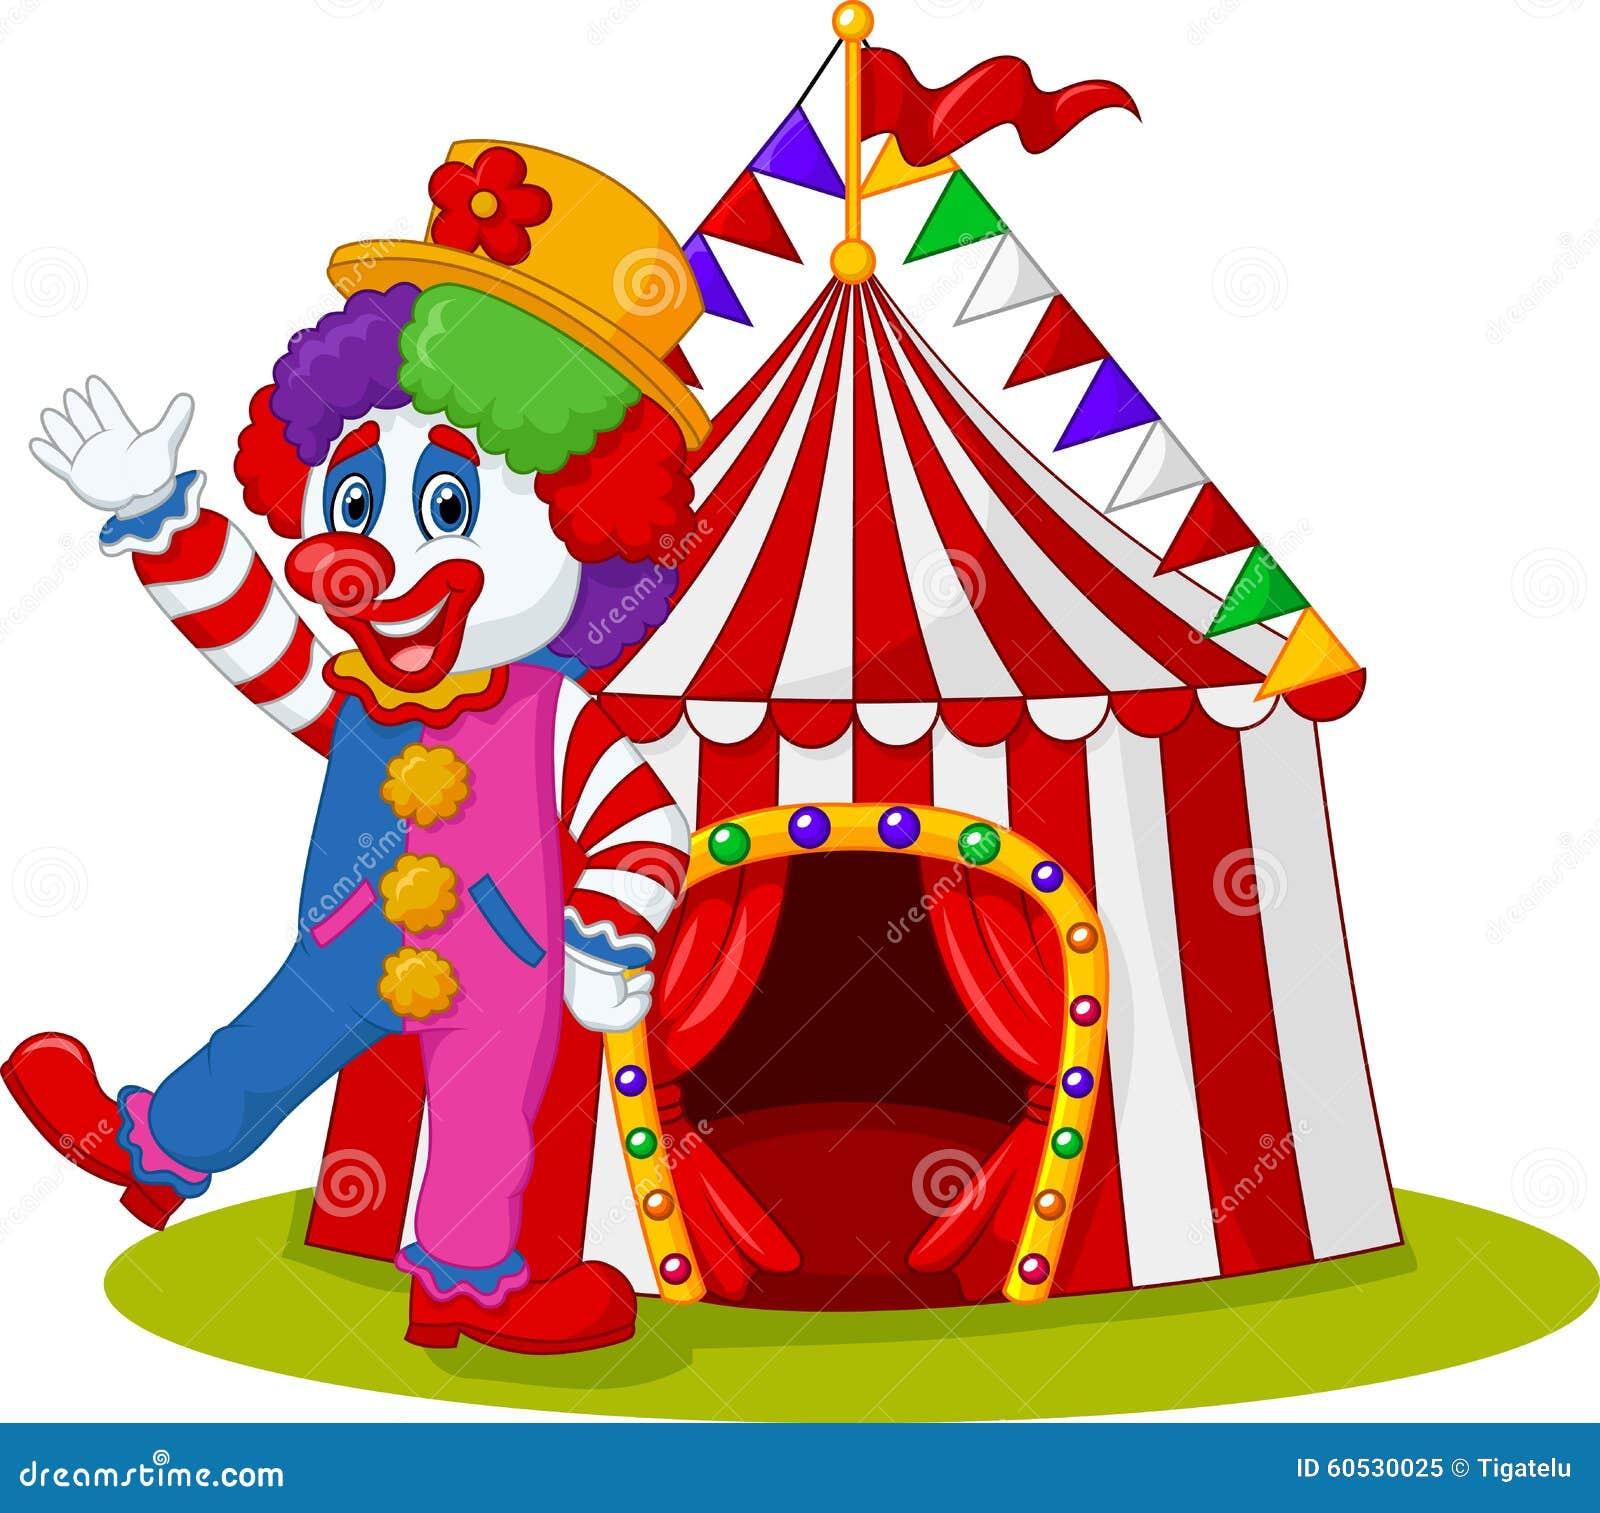 Cartoon clown waving hand  sc 1 st  Dreamstime.com & Cartoon clown waving hand stock vector. Illustration of happy ...